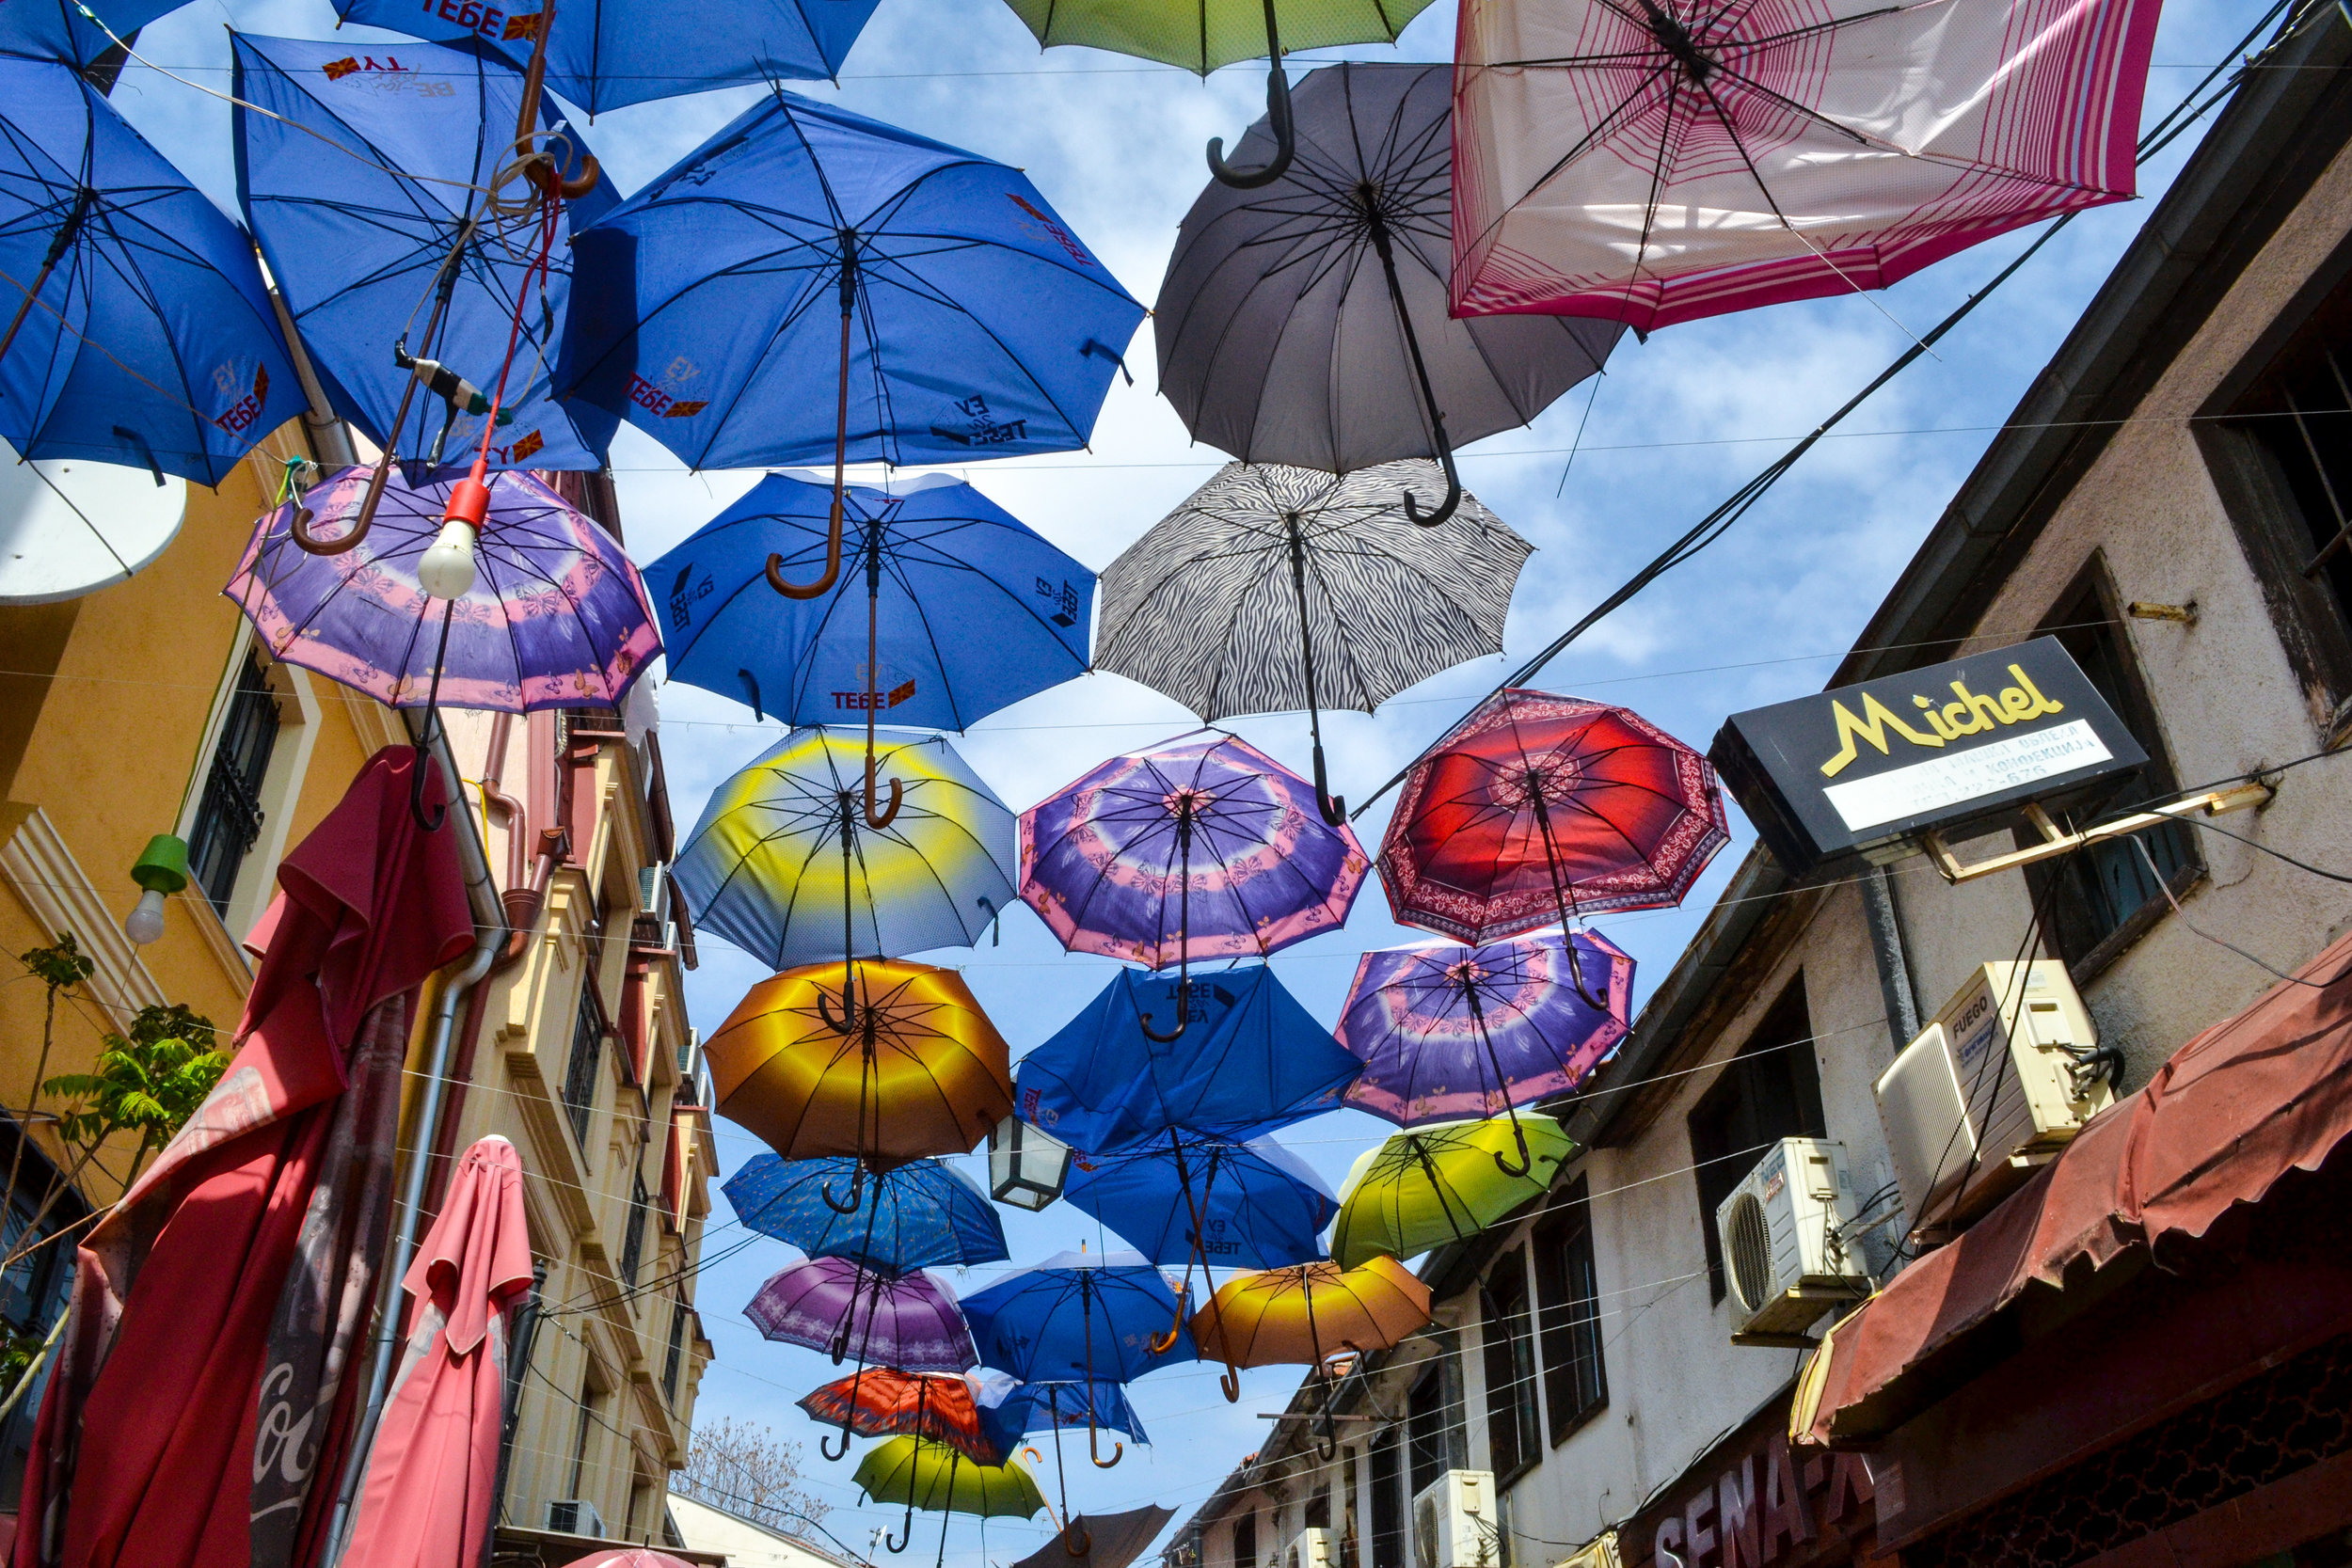 Umbrellas Upclose Skoje.jpg